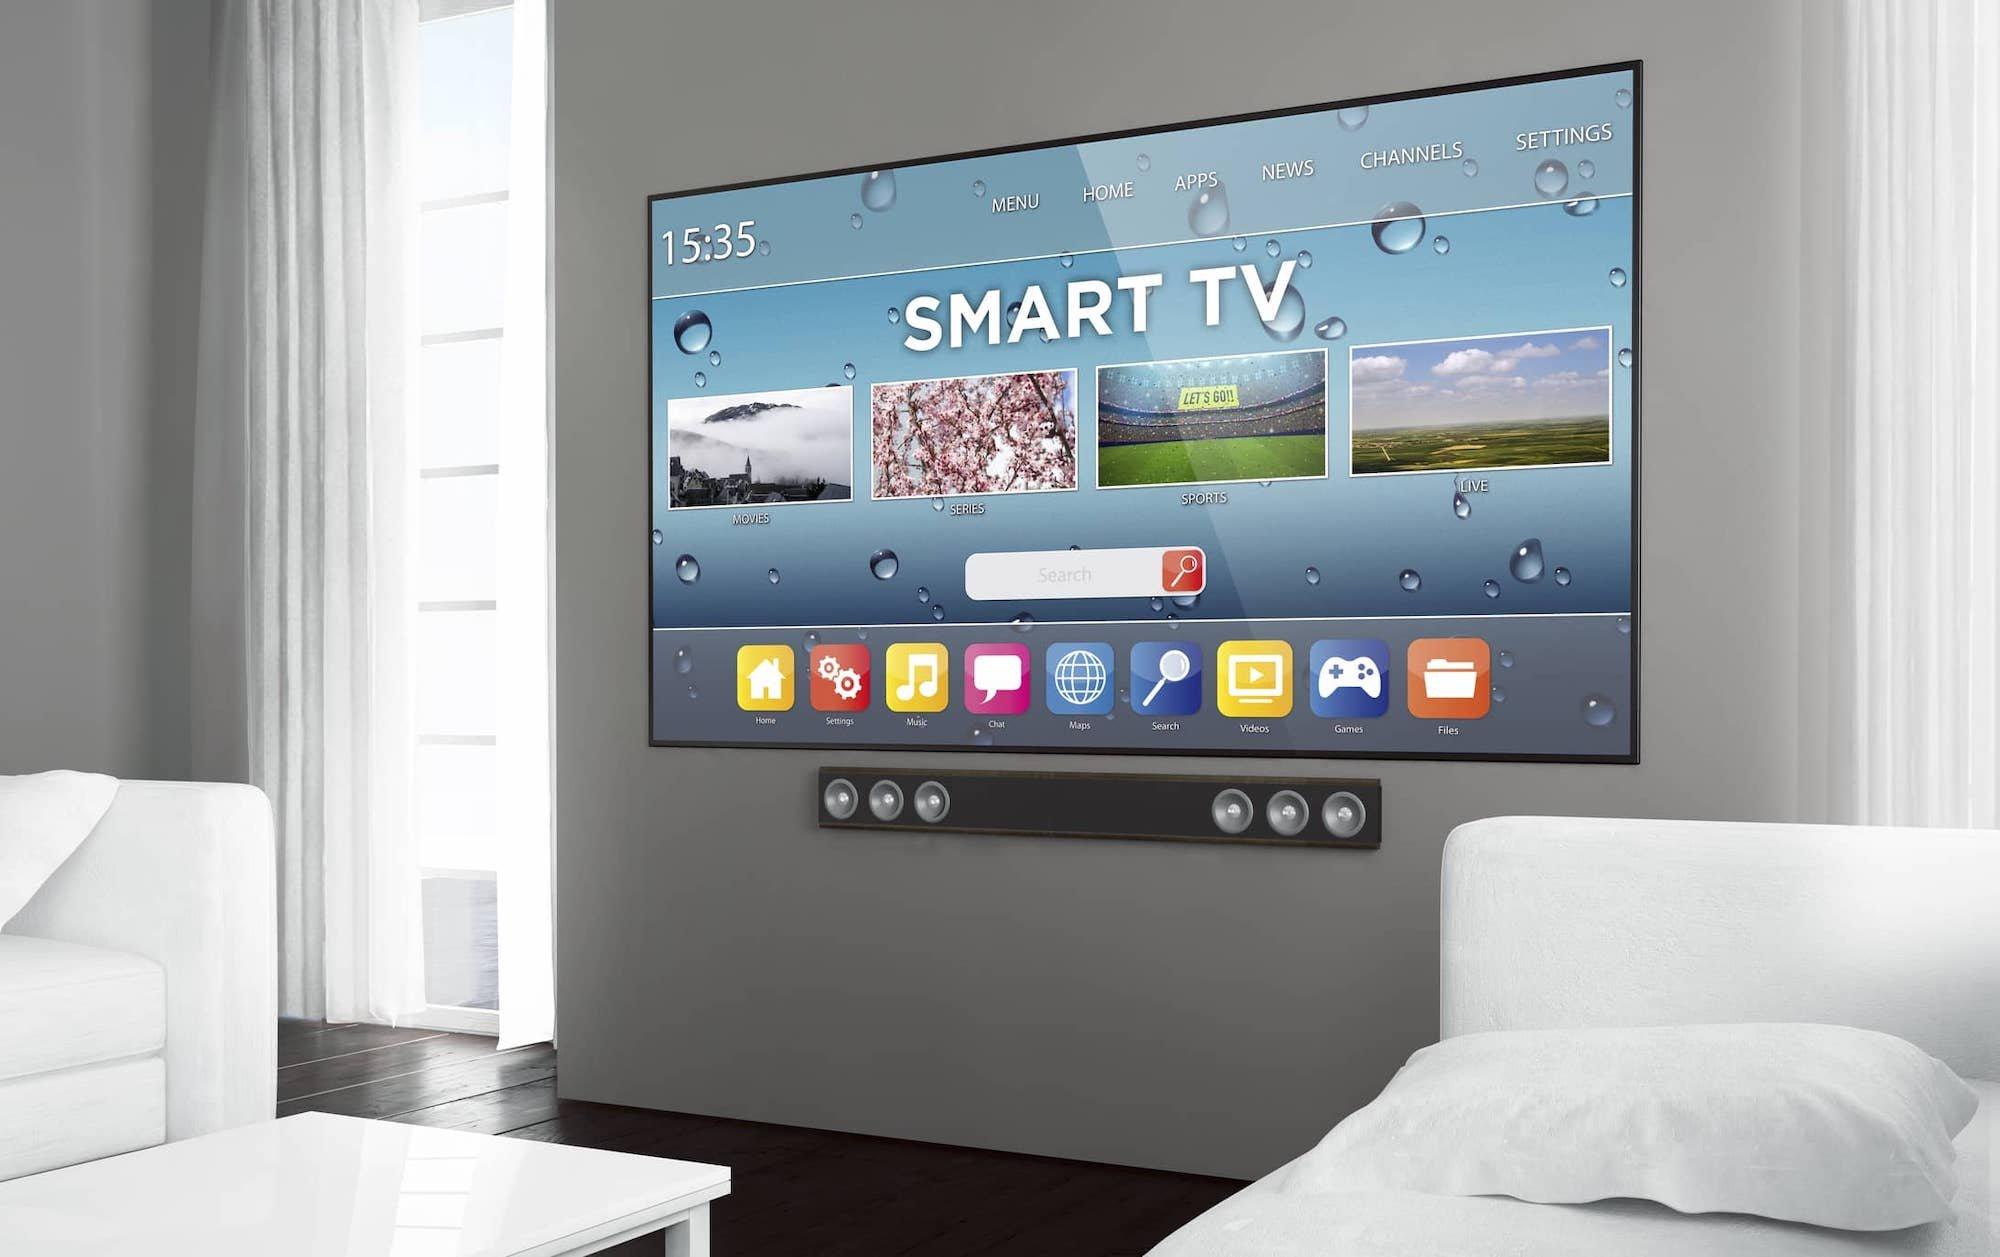 Seamless Integration with Smart TVs